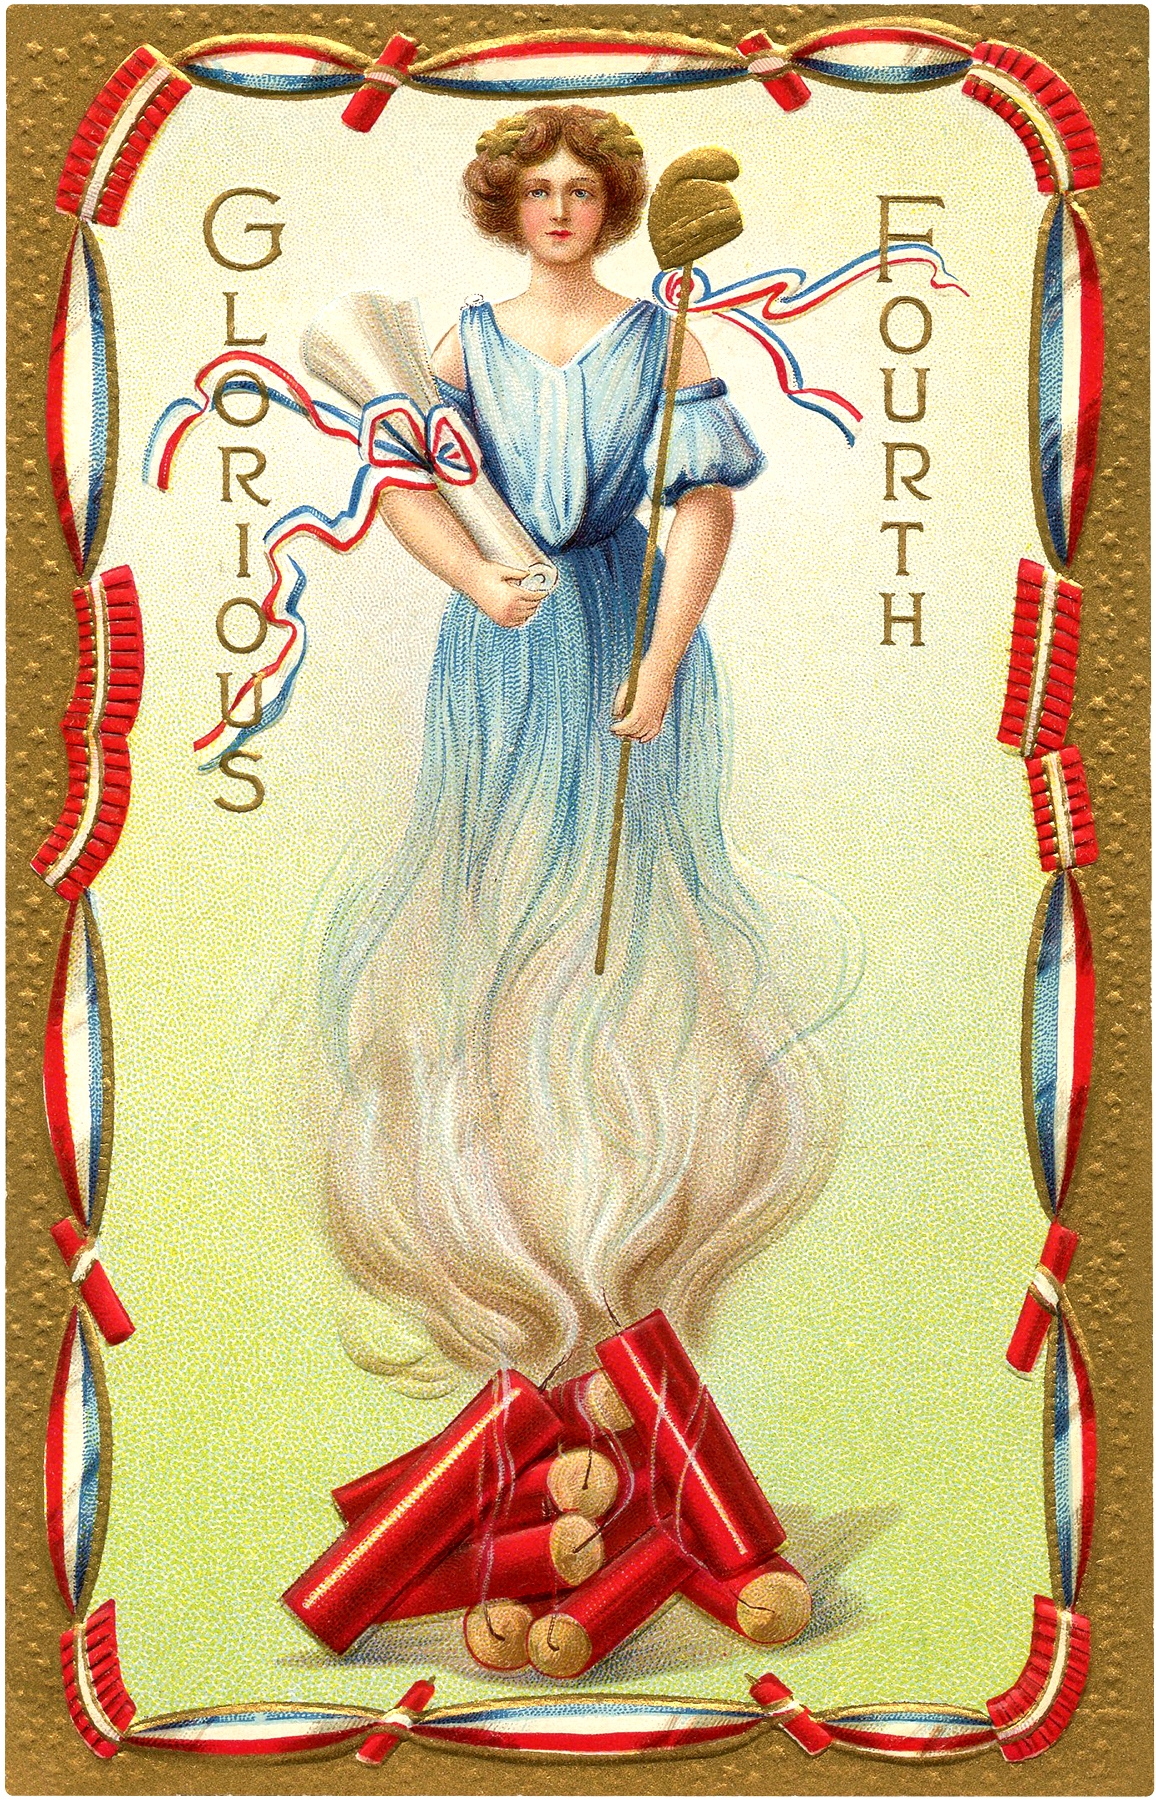 Vintage Firecracker Lady Image